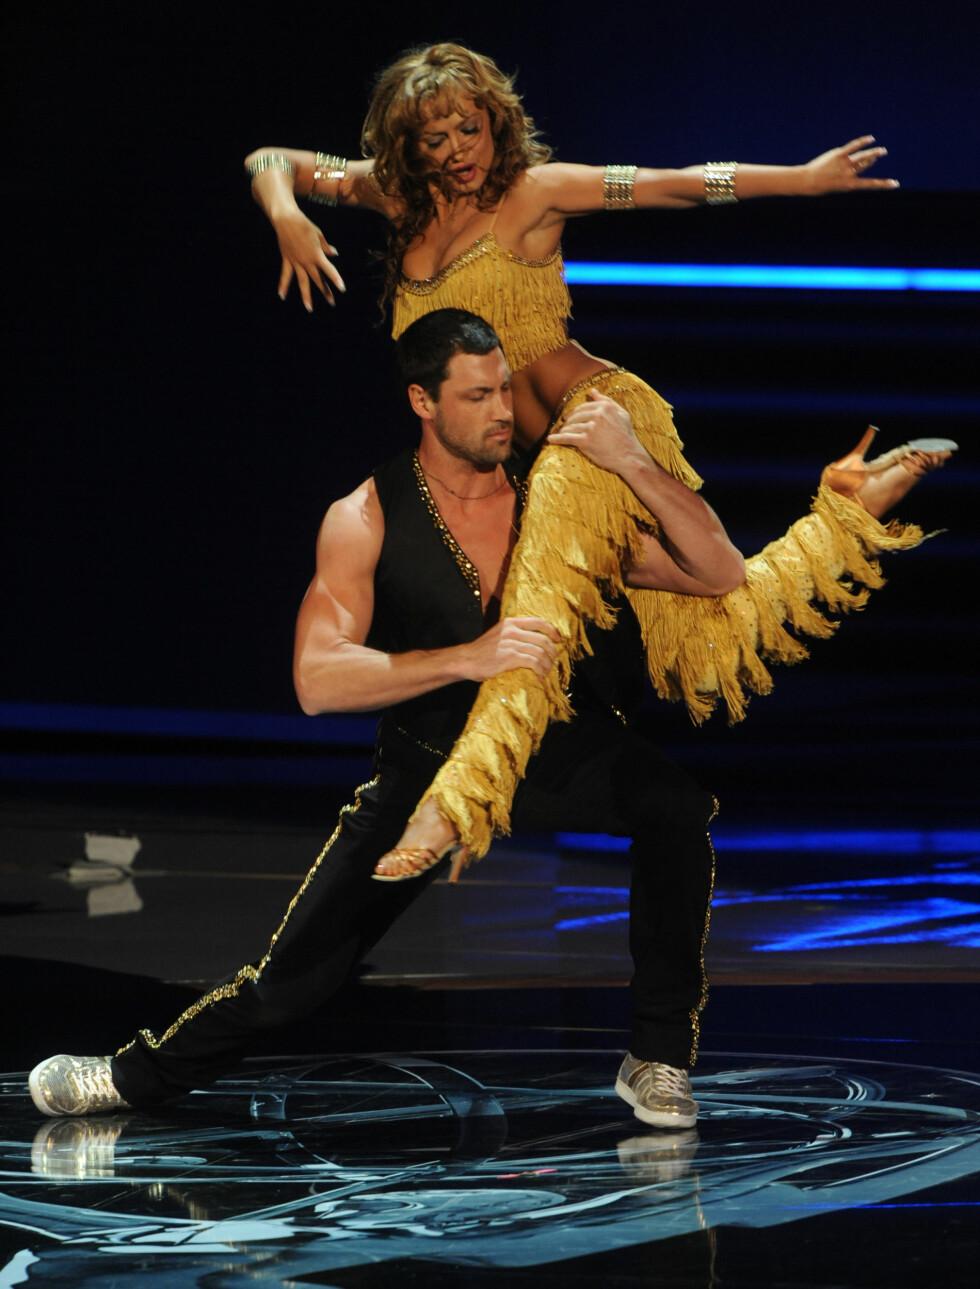 EKSER: Maksim var tidligere forlovet med Dancing With the Stars-kollega Karina Smirnoff, men de to endte forlovelsen høsten 2009. Foto: Stella Pictures